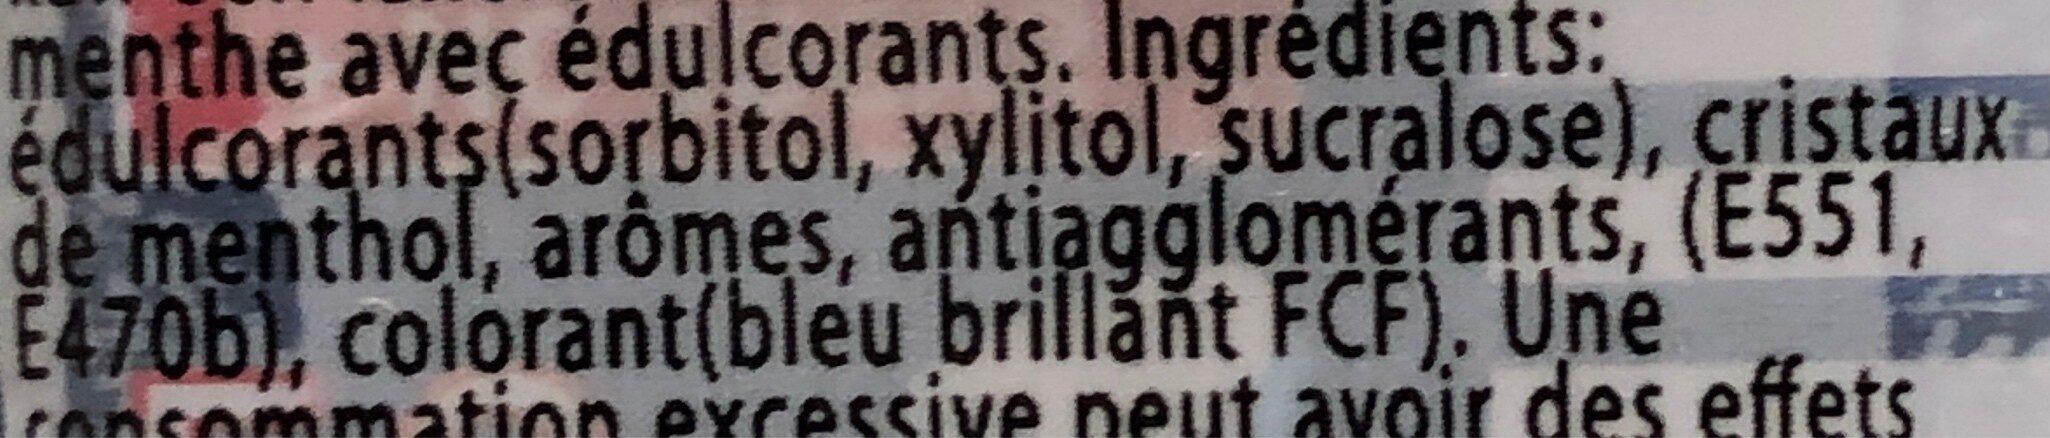 Hiker's mint - Ingredients - fr